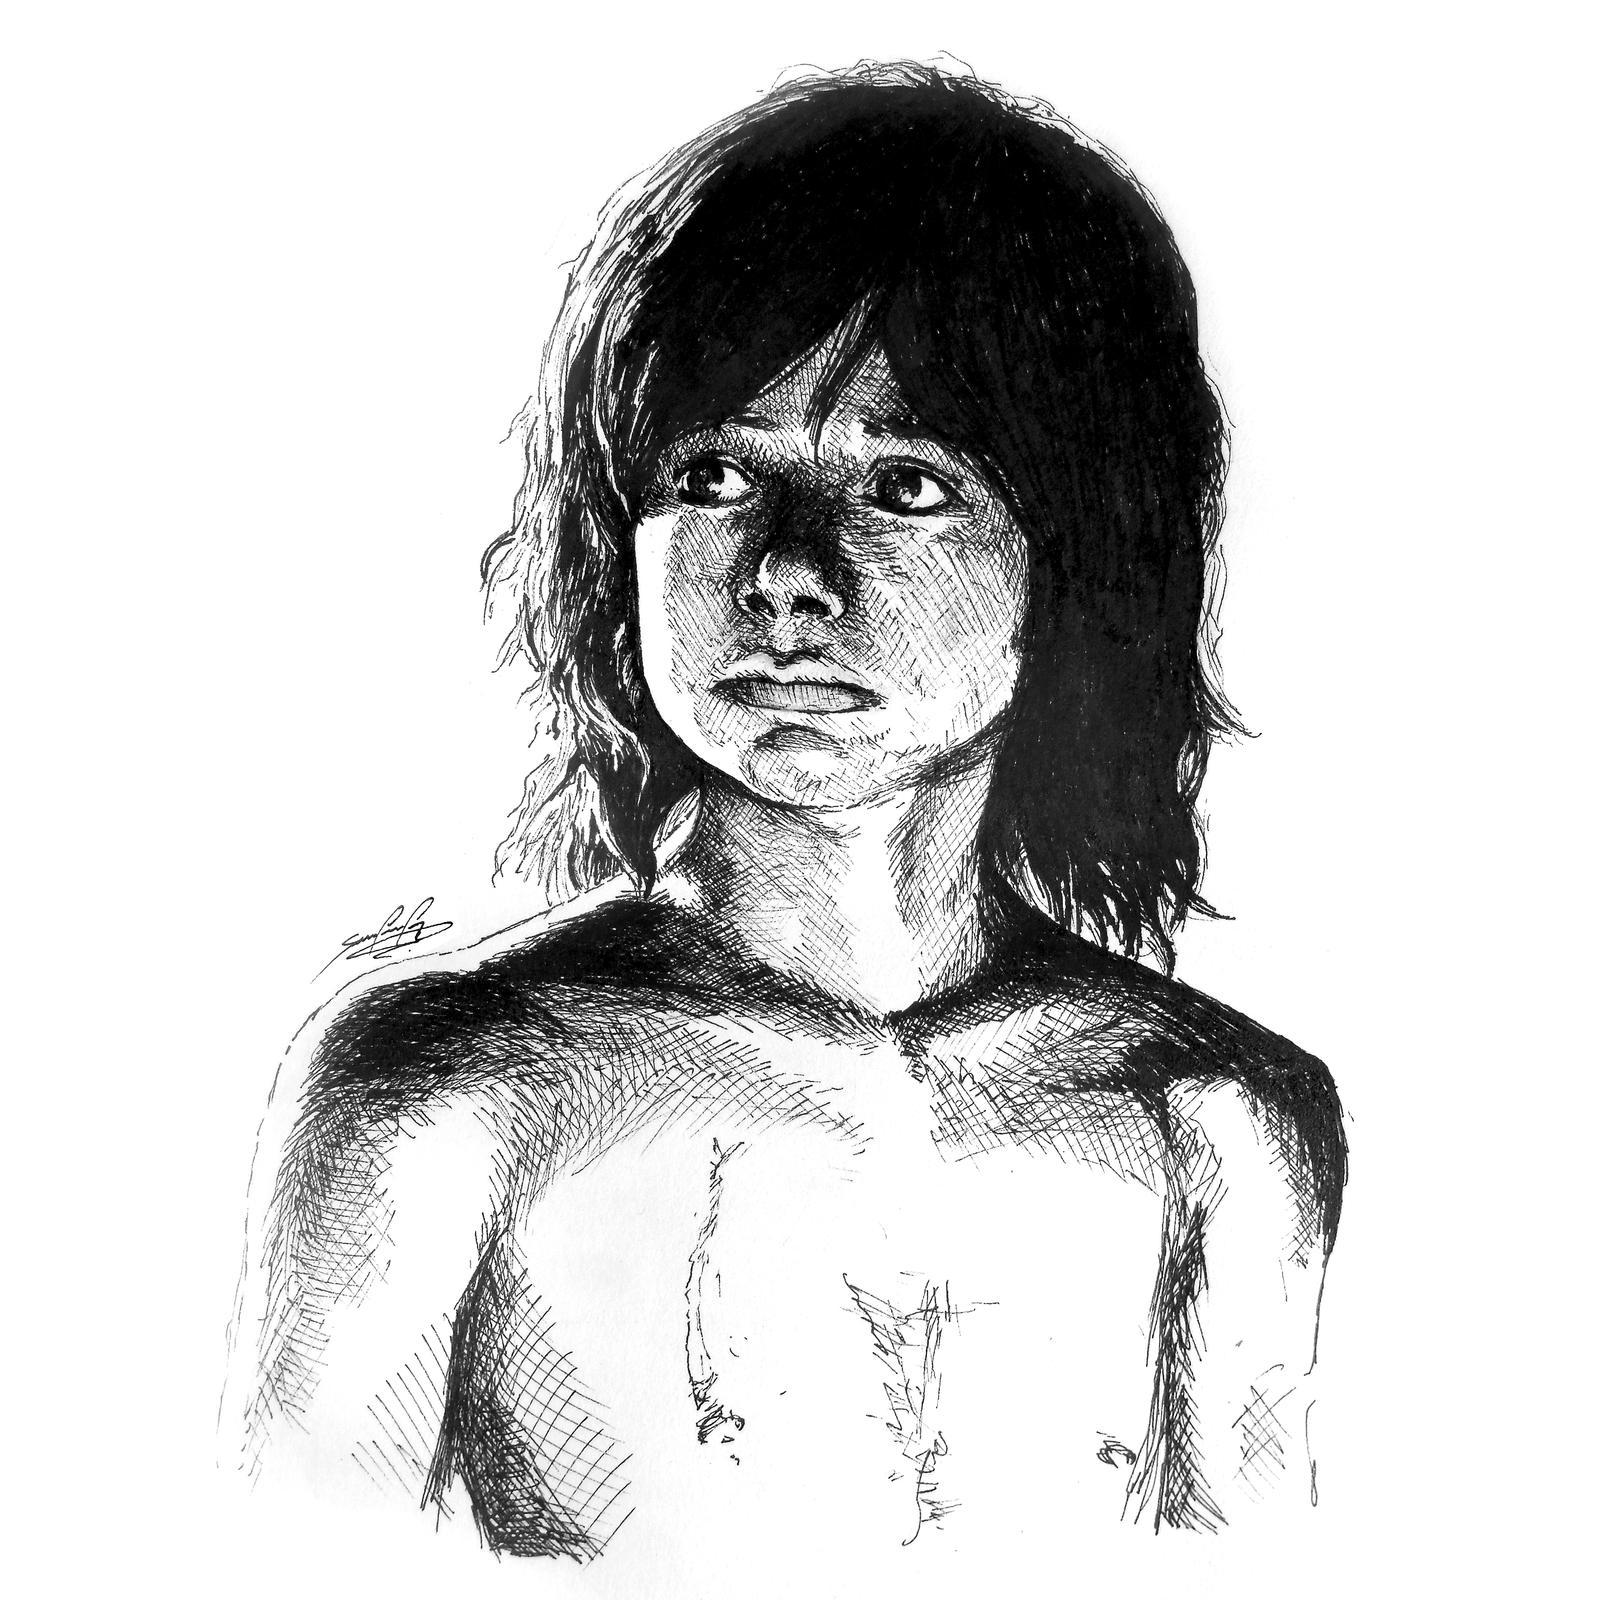 Mowgli - The Jungle Book. by wafspr